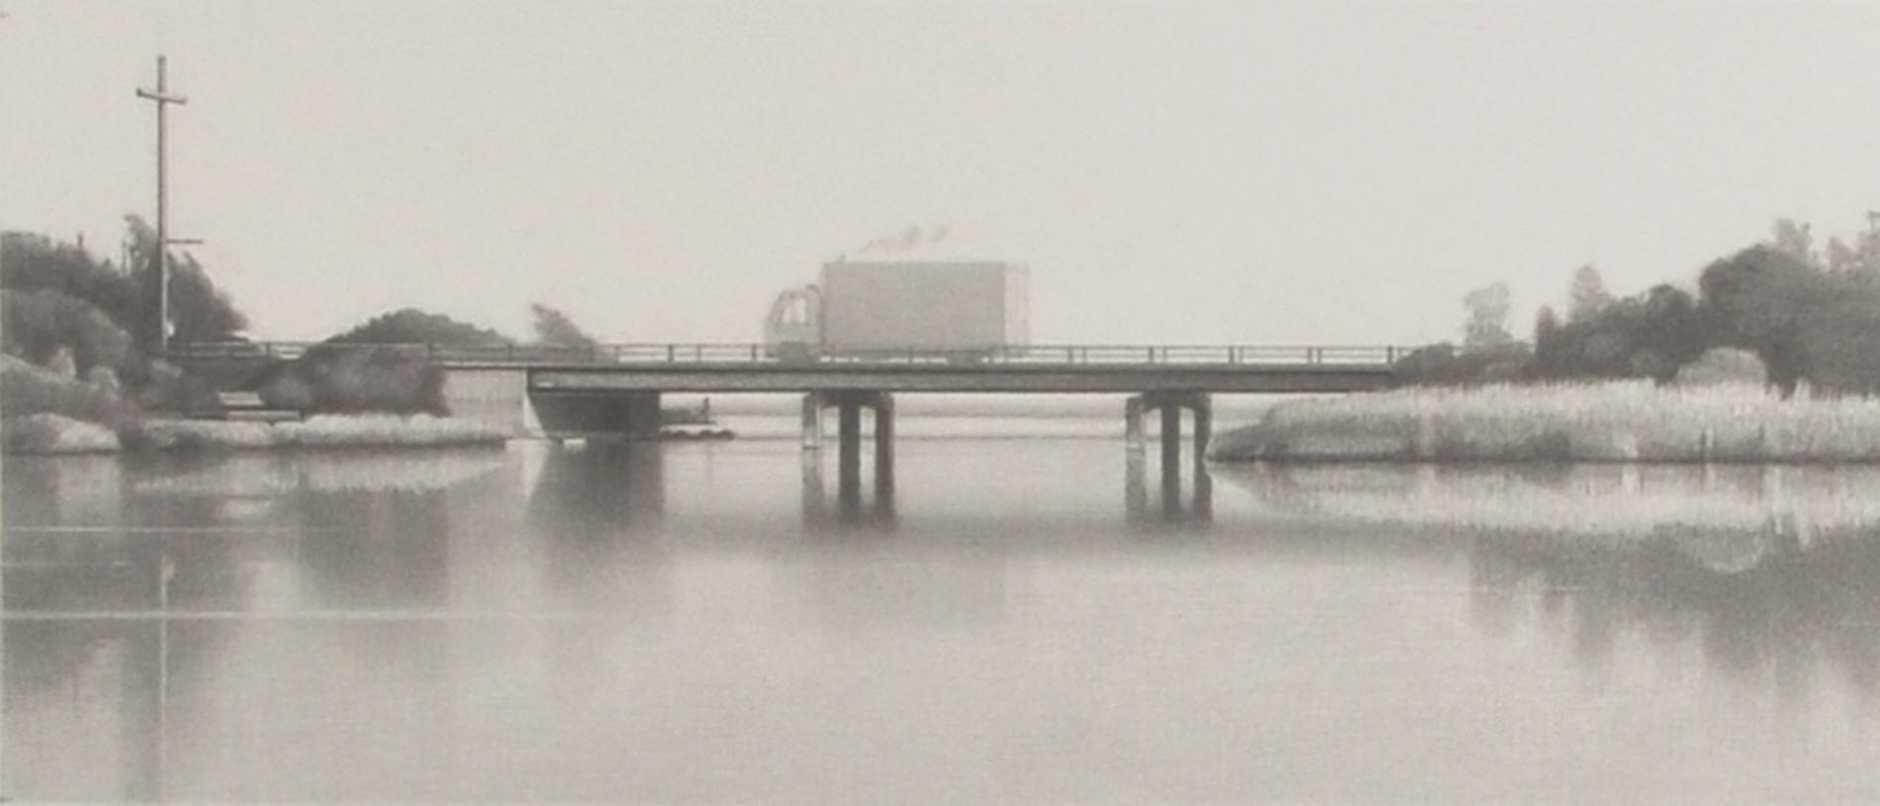 Ken Smith, A truck crossing a bridge by the sea